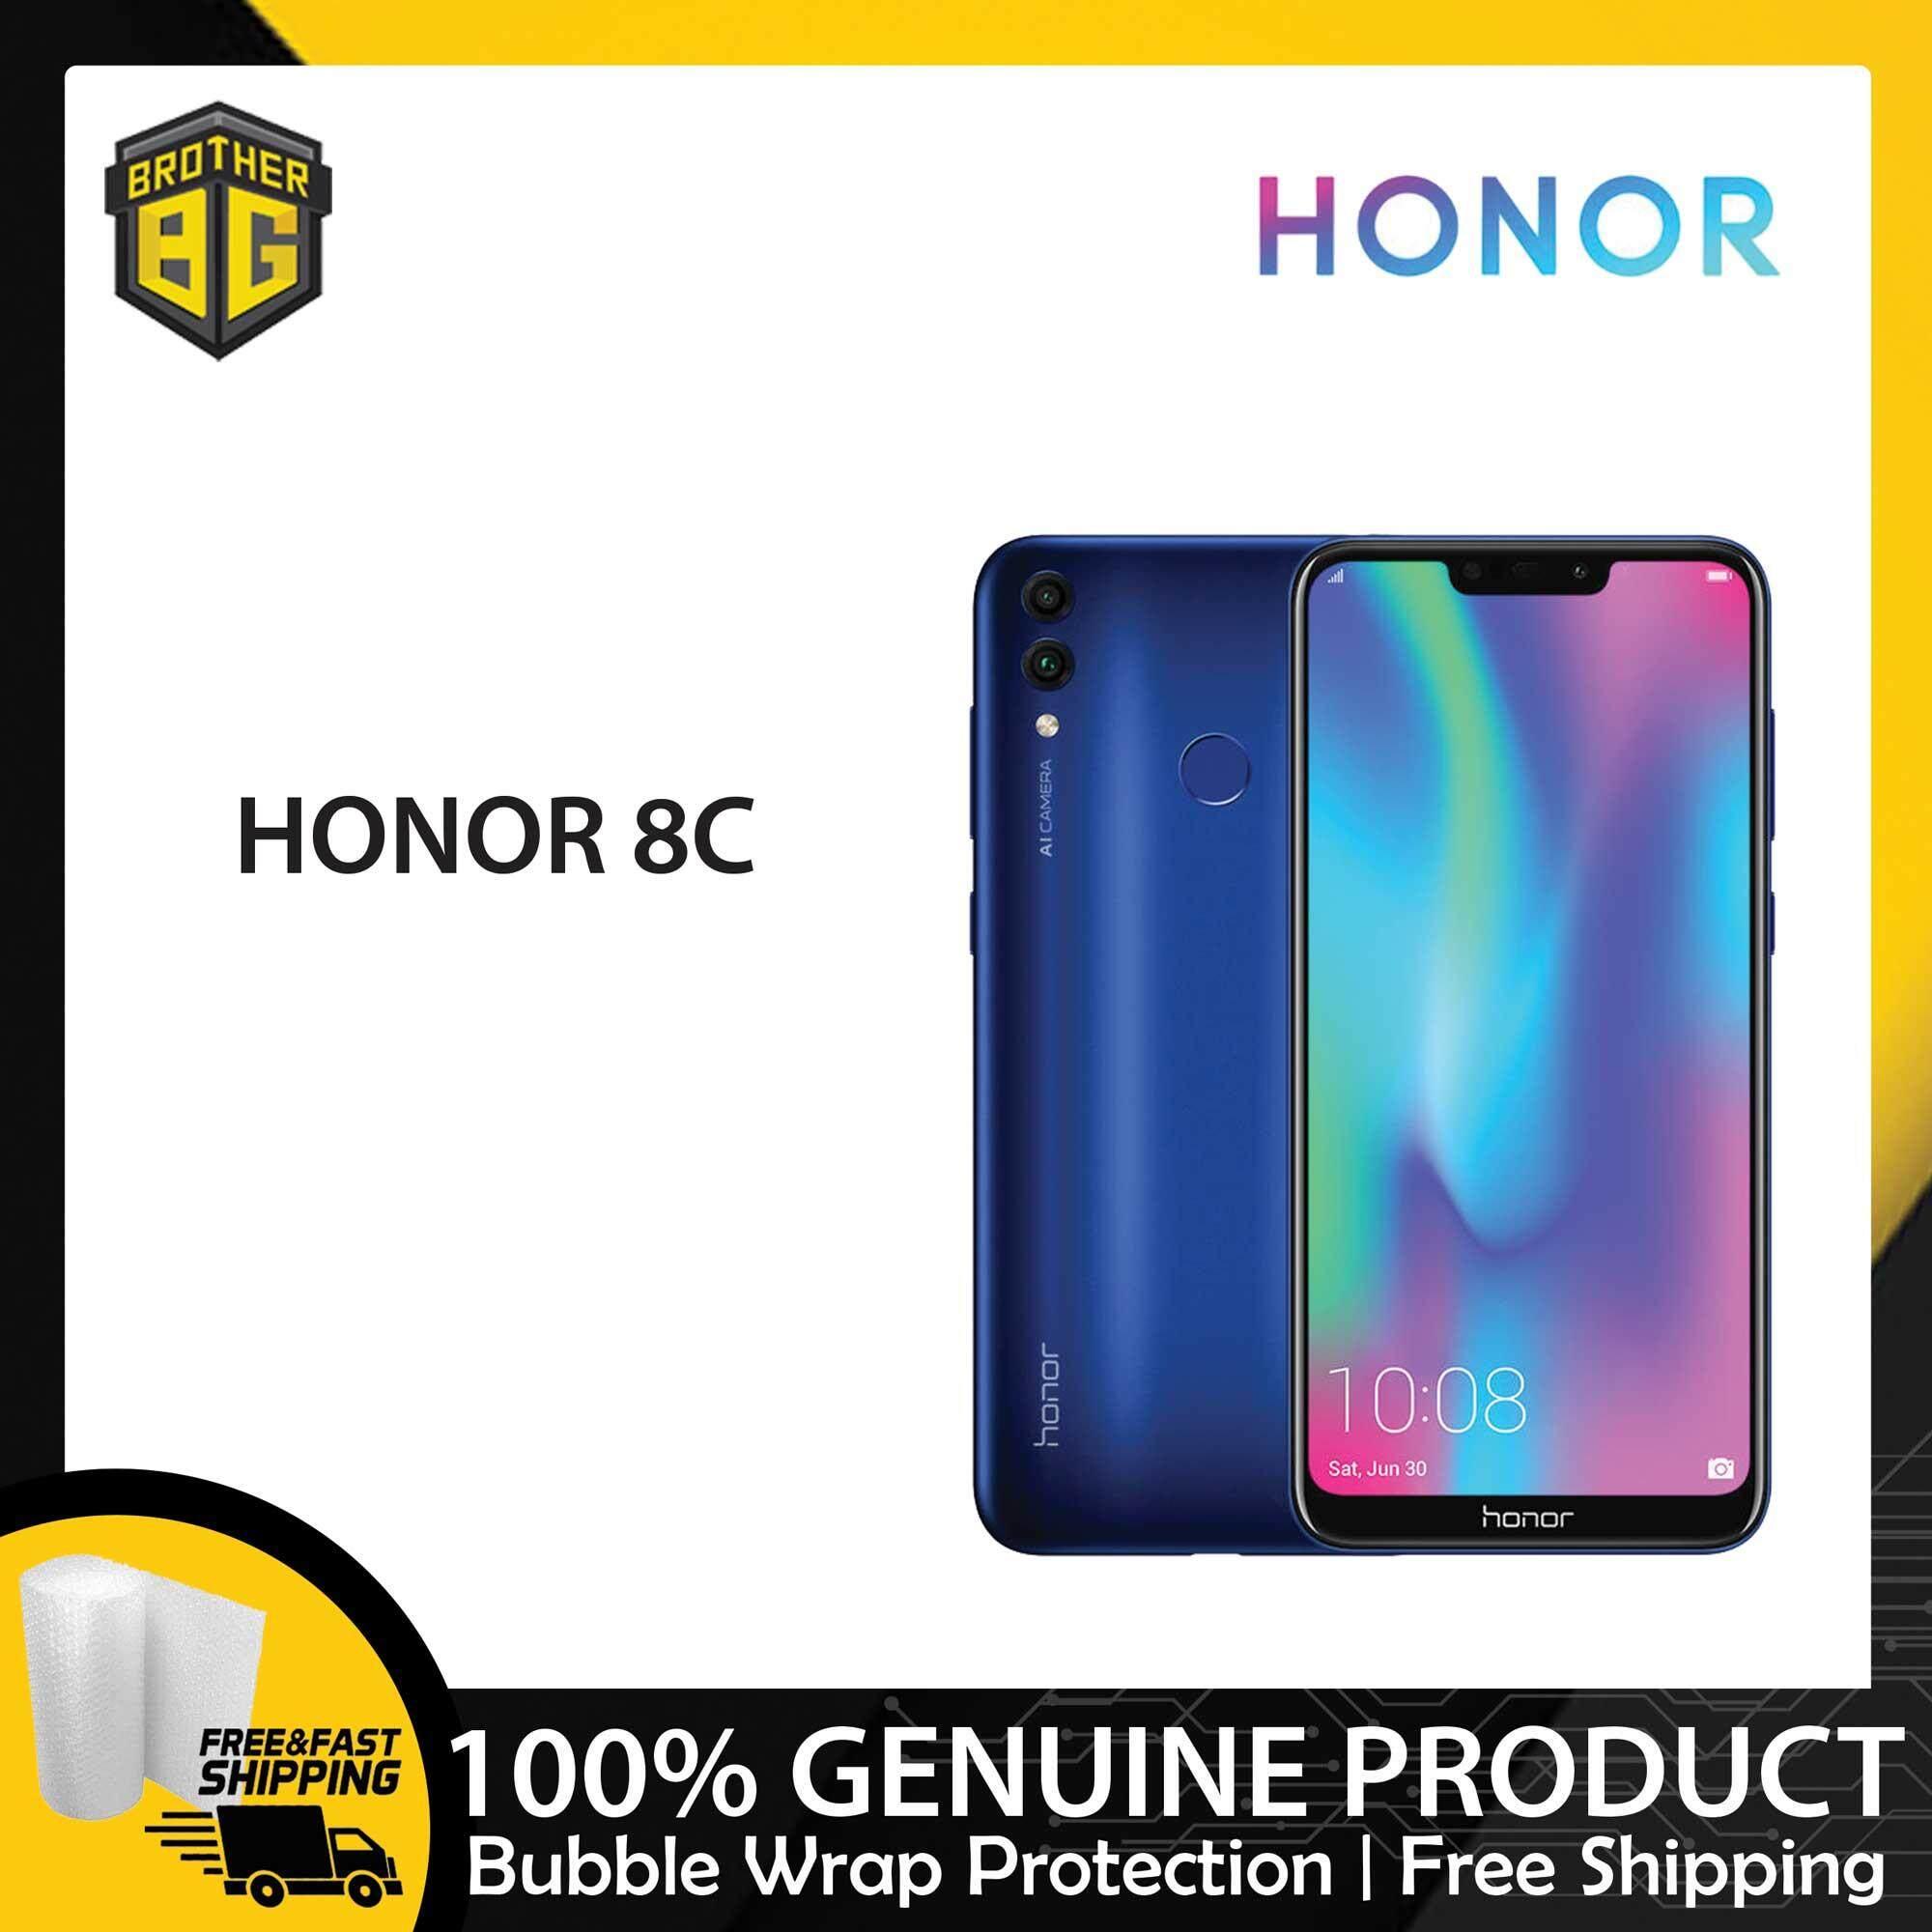 HONOR 8C 3GB+32GB - Original Malaysia Set